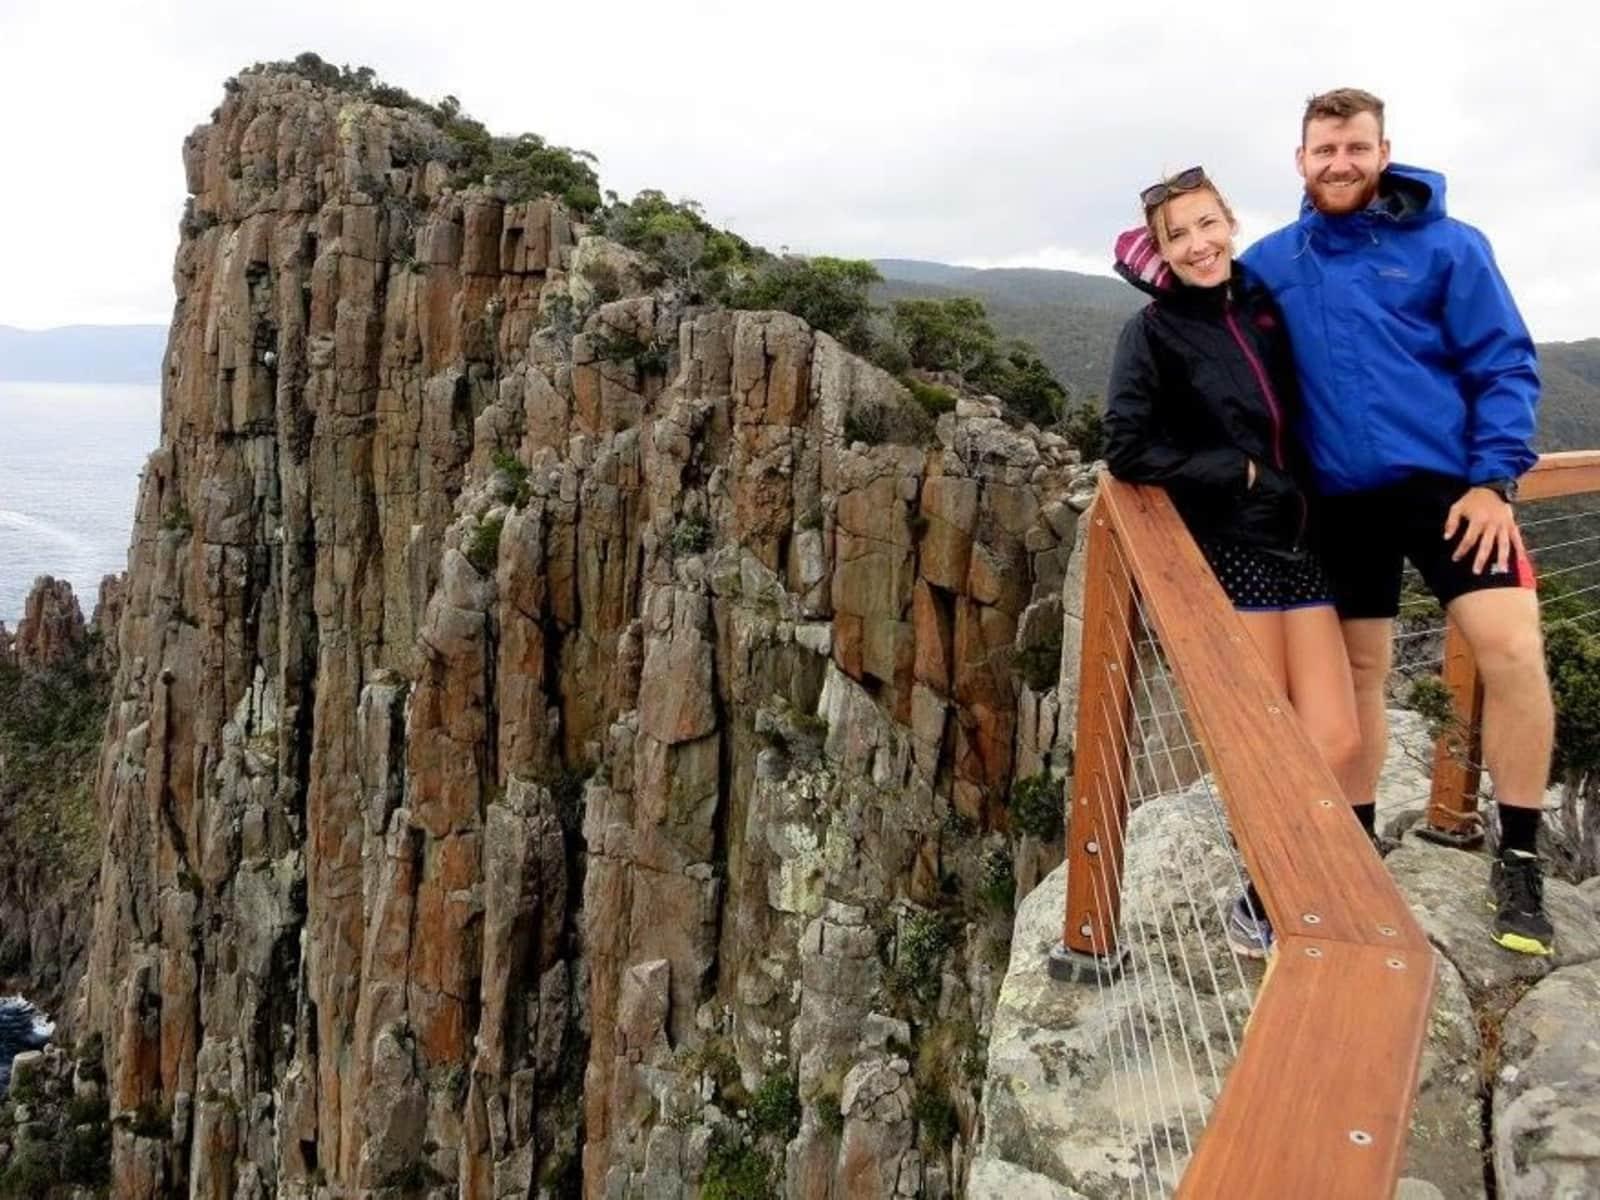 Cleo & Tom from Cairns, Queensland, Australia